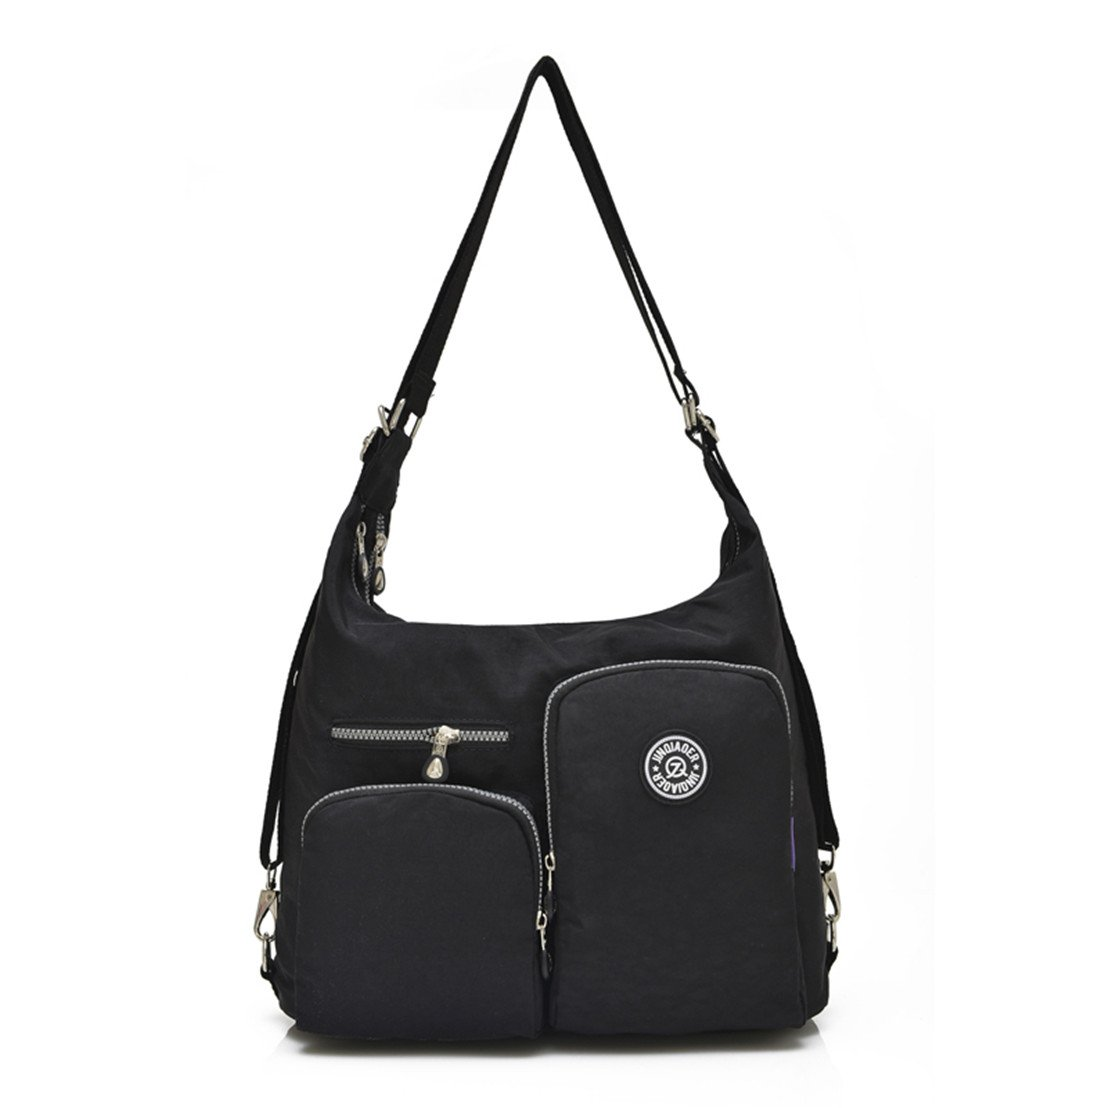 TianHengYi Women's Multifunctional Water Resistant Nylon Shoulder Bag Solid Travle Backpack Organizer Black